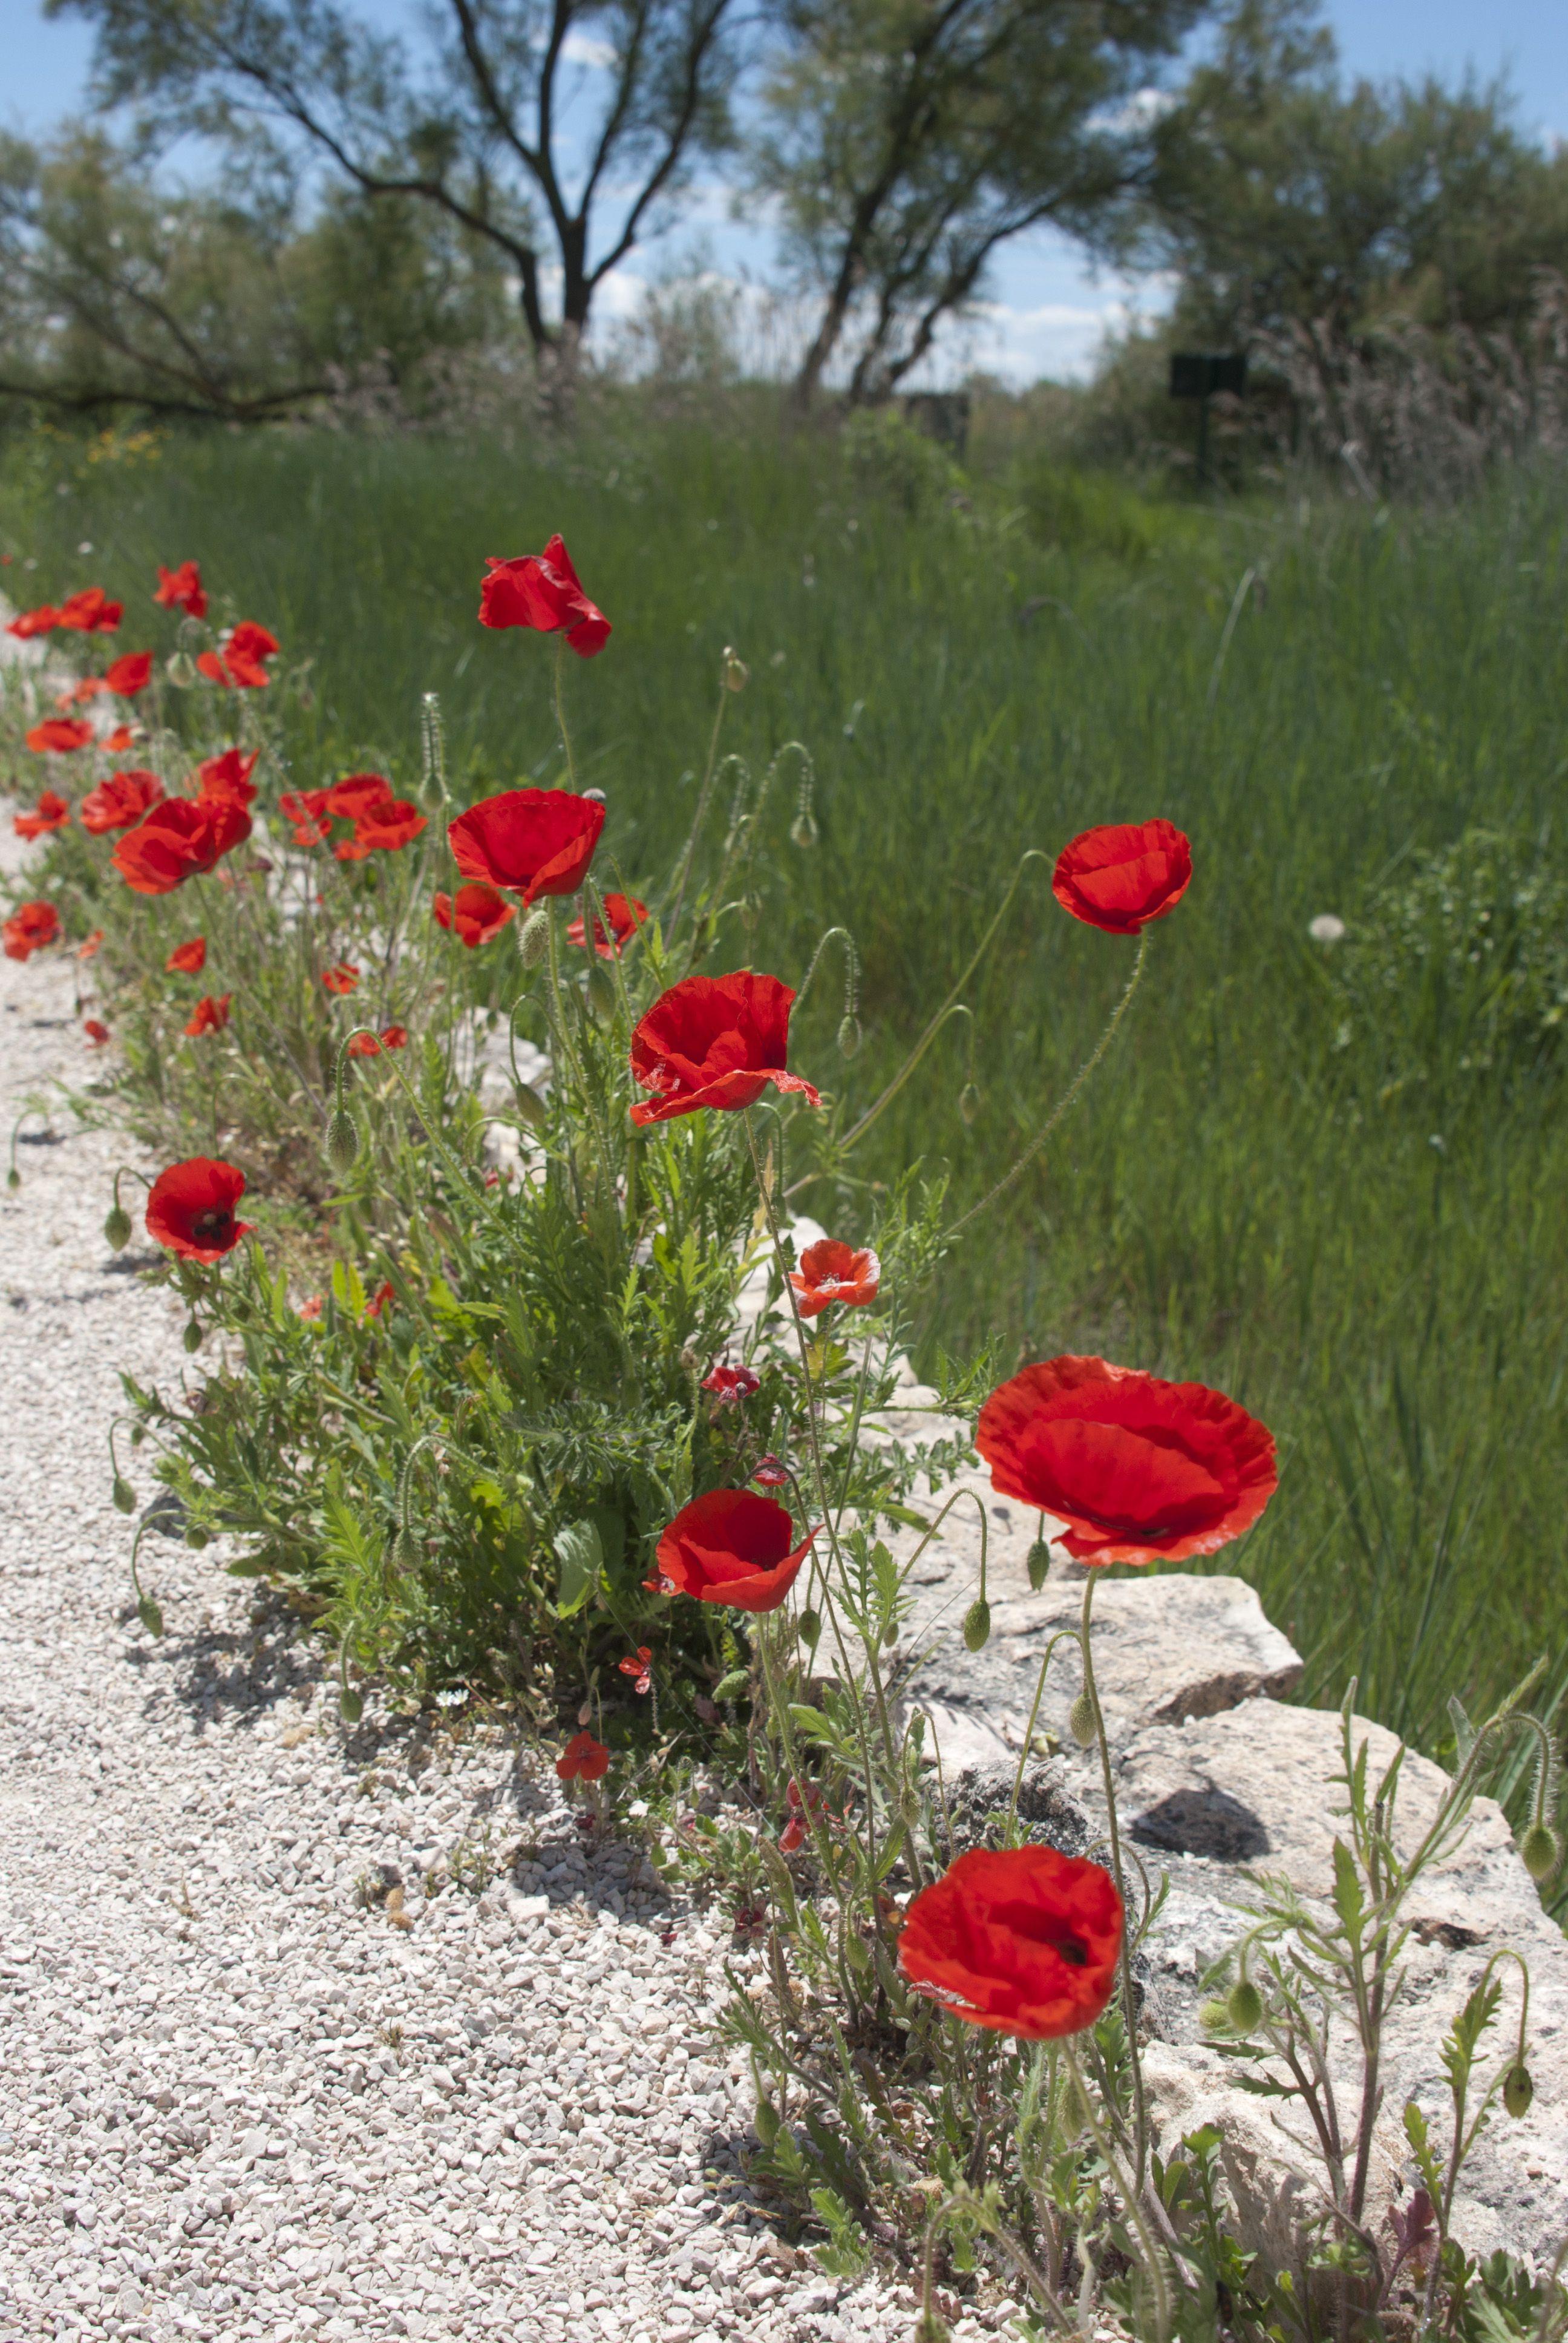 Tablas de Daimiel, Spain. Poppies, by Raquel Climent.